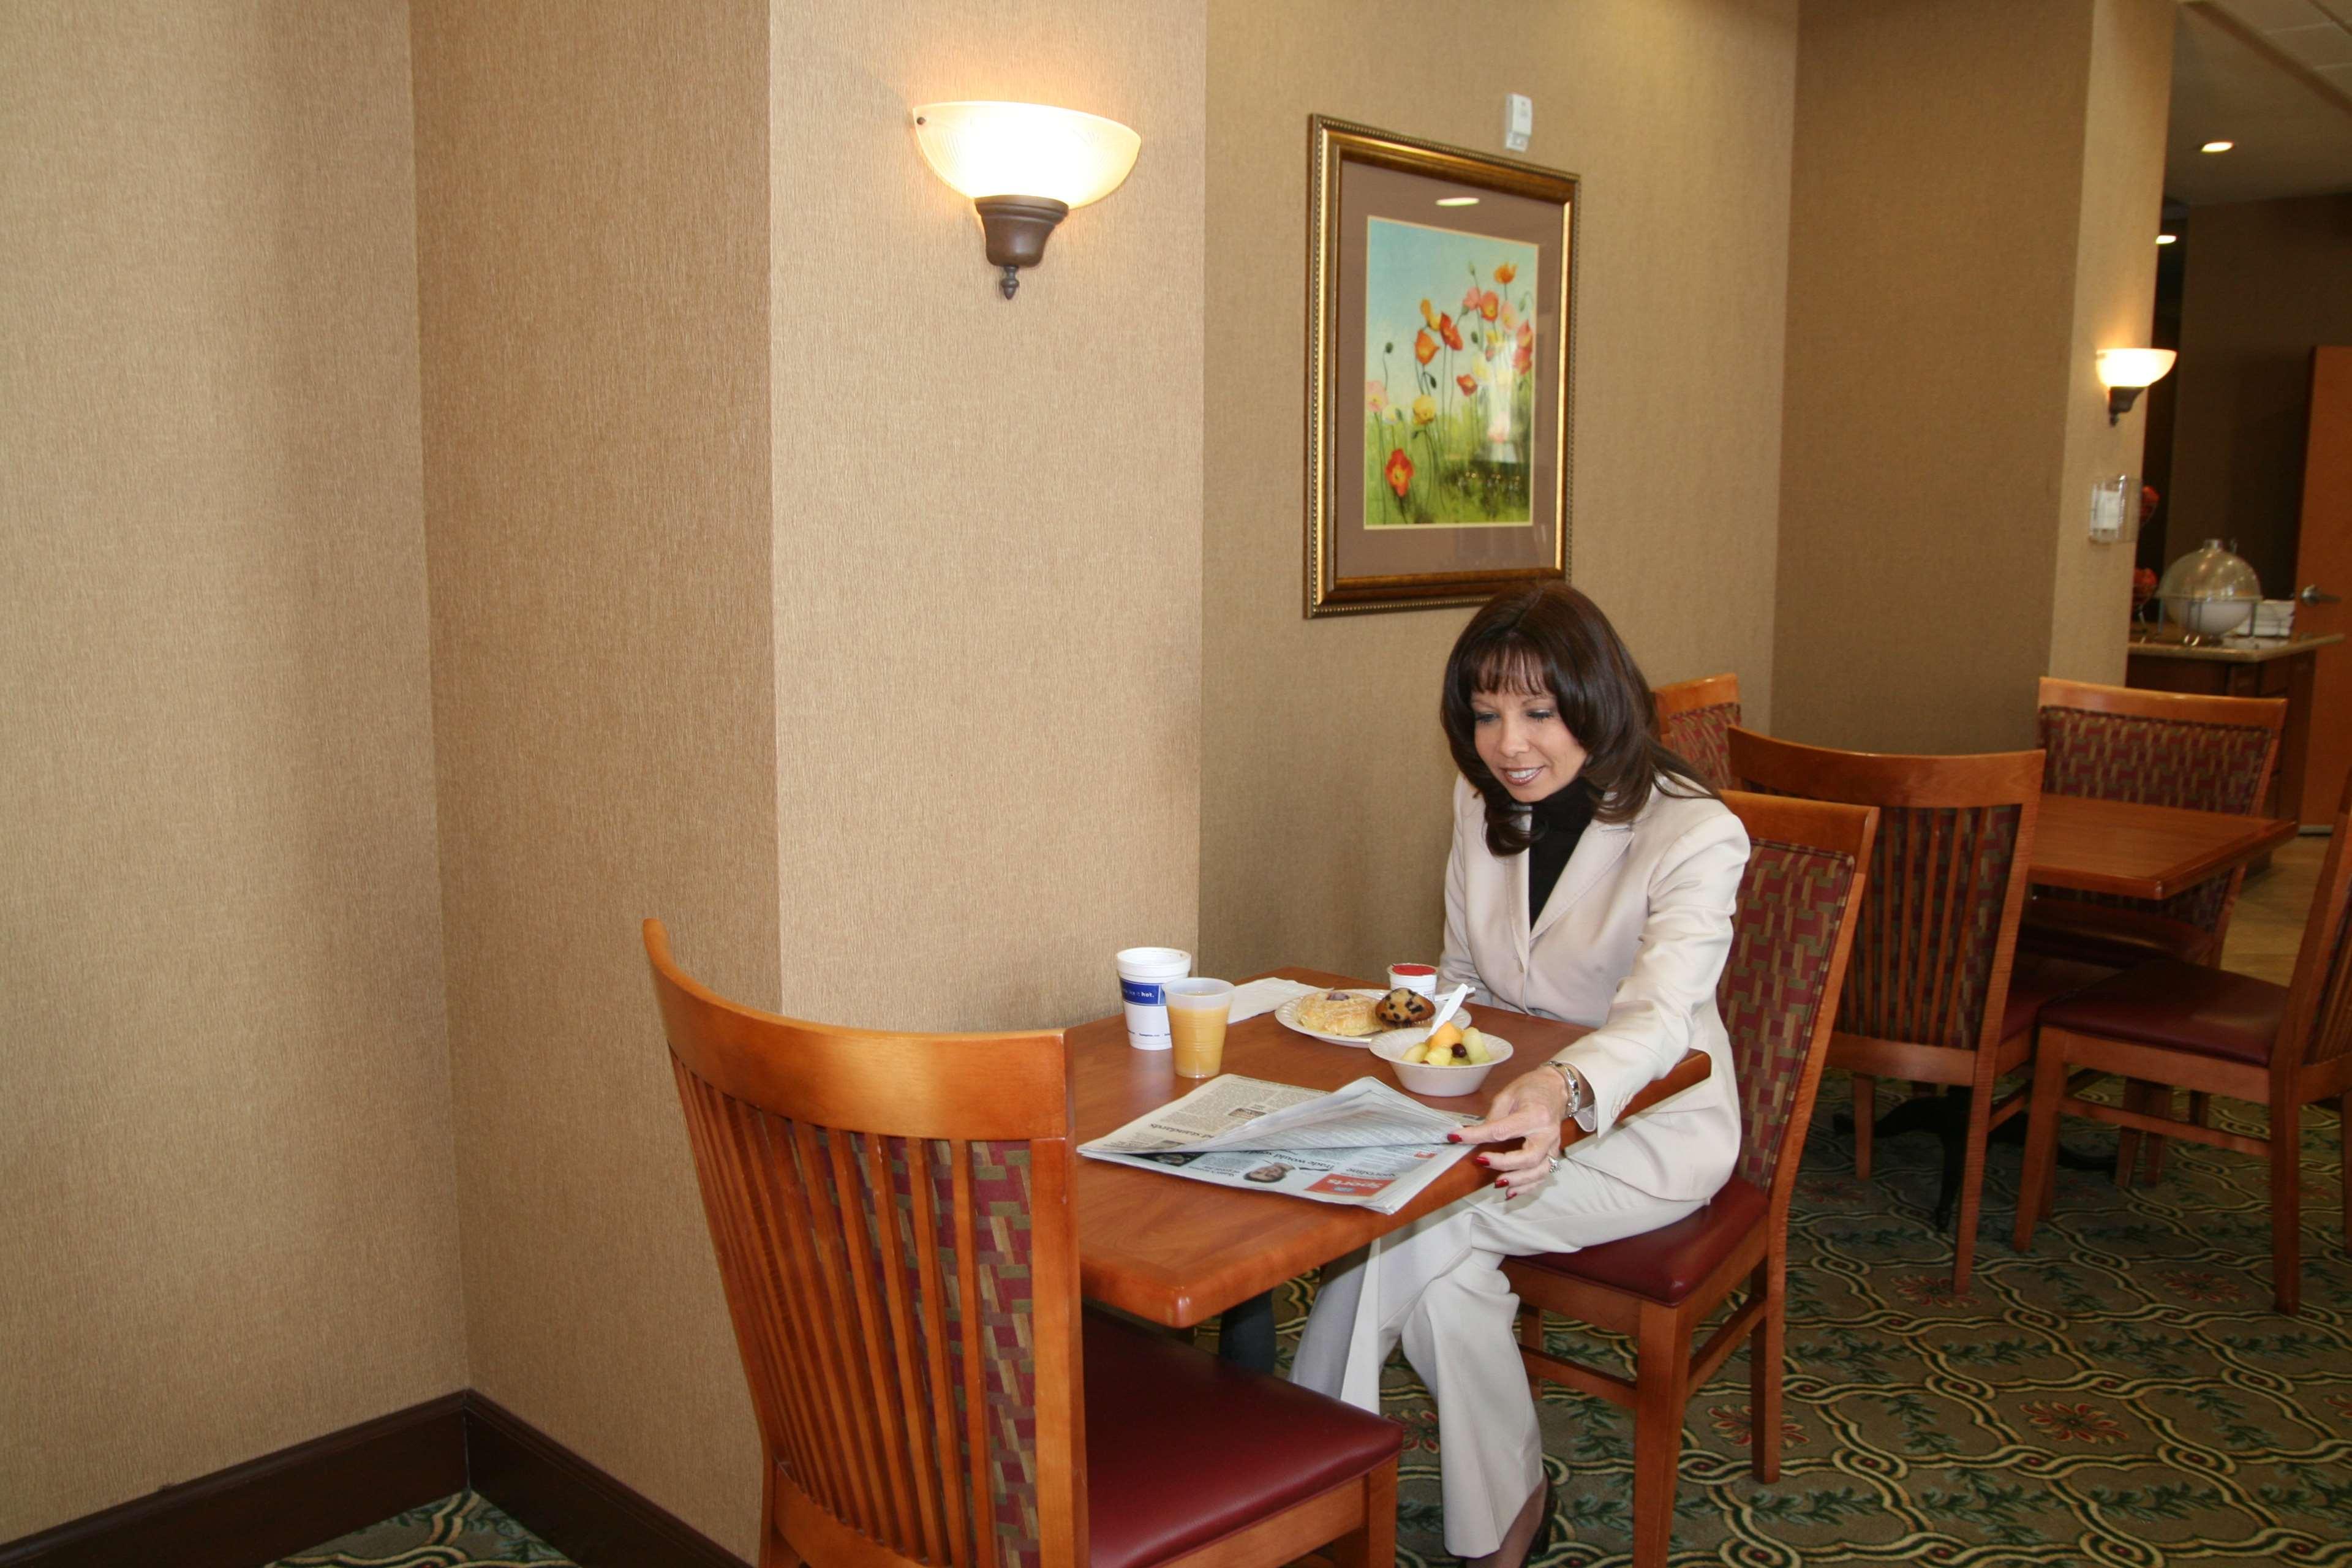 Hampton Inn & Suites Rohnert Park - Sonoma County image 4